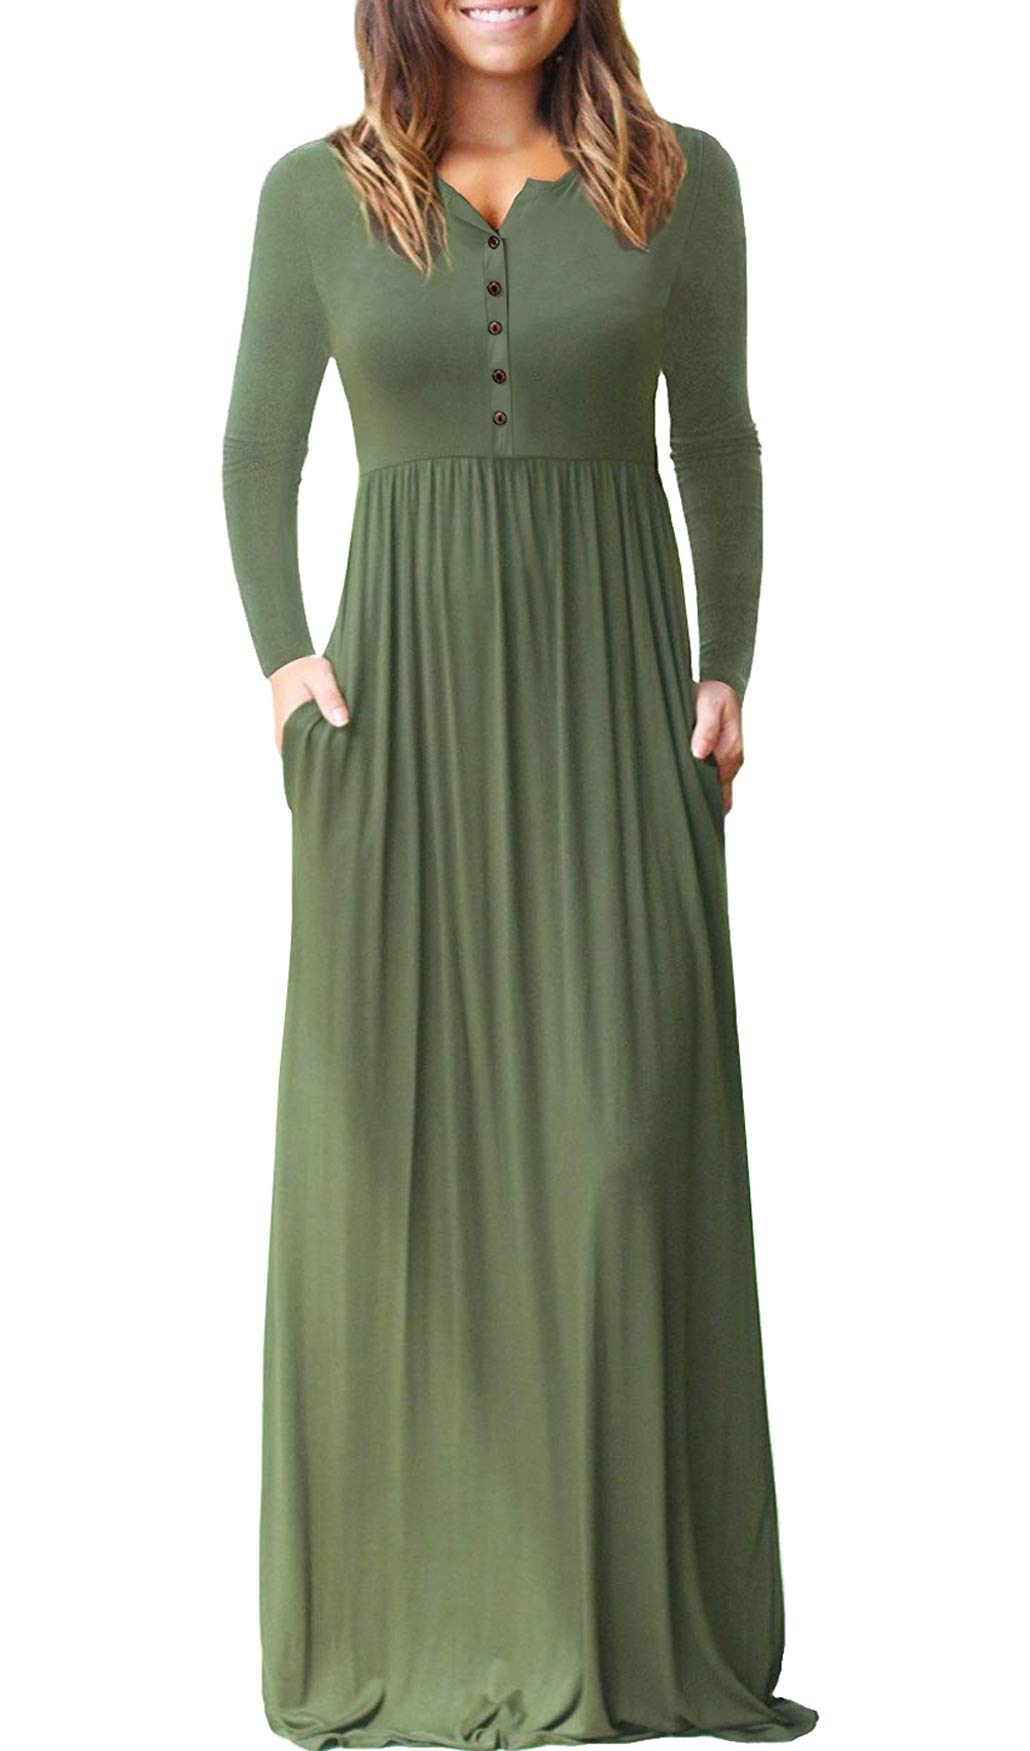 8f86dfe59fd Dearlovers Womens High Waisted Casual Long Sleeve Loose Plain Long Maxi  Dresses Army Green M